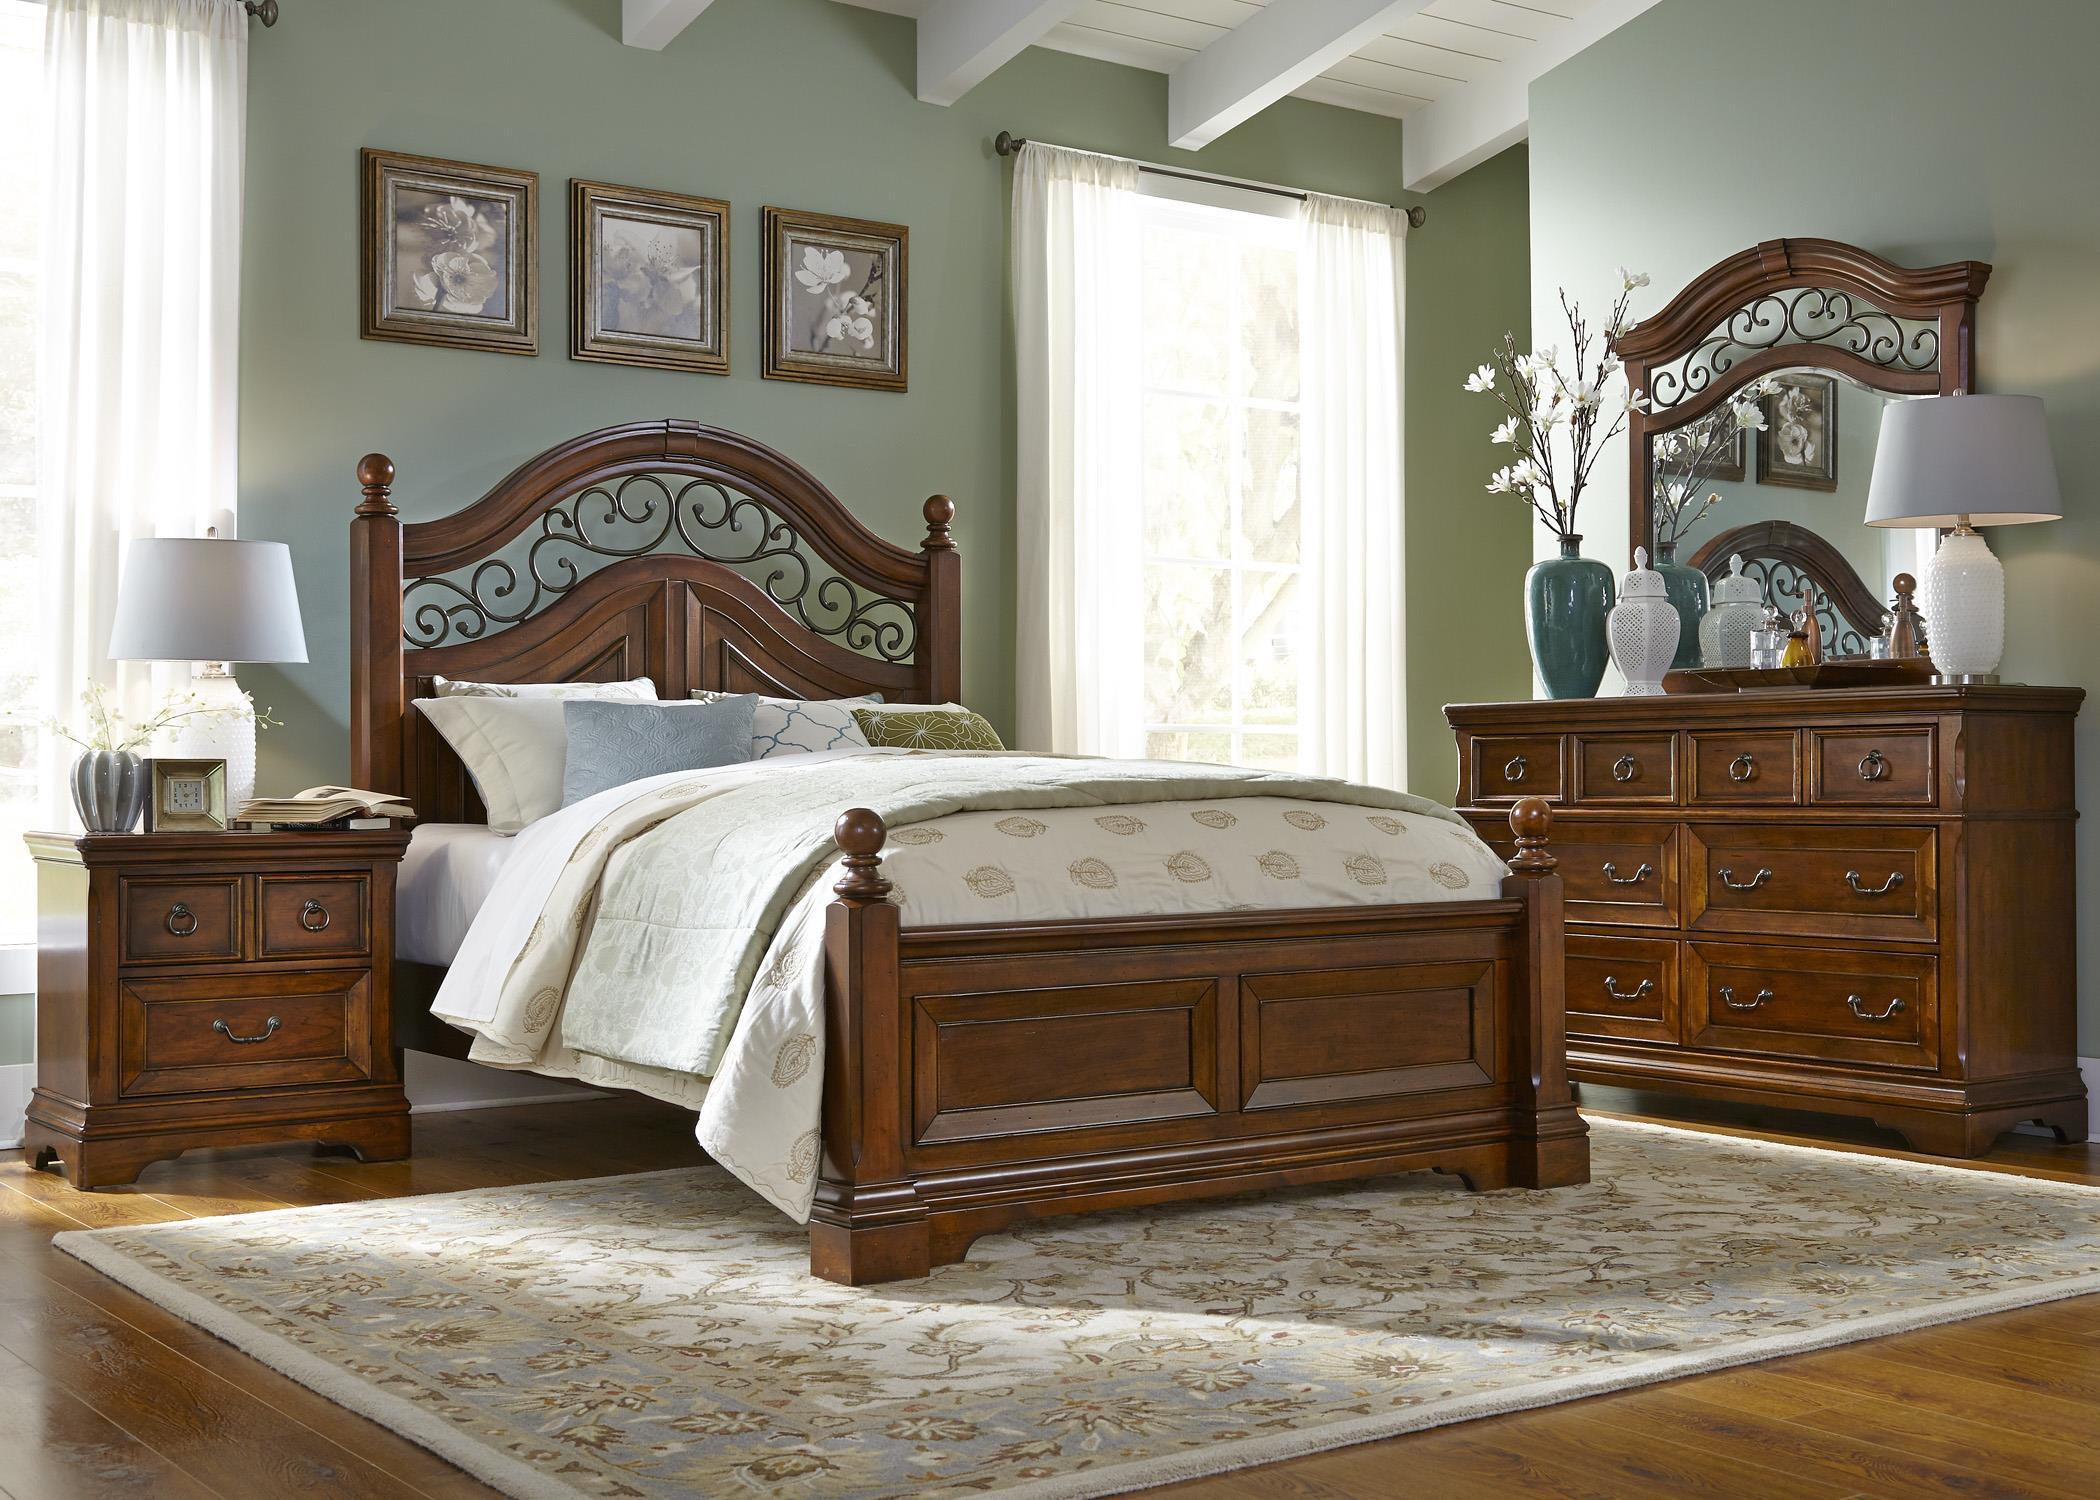 Liberty Furniture Laurelwood King Poster Bed, Dresser & Mirror, N/S - Item Number: 547-BR-GP70